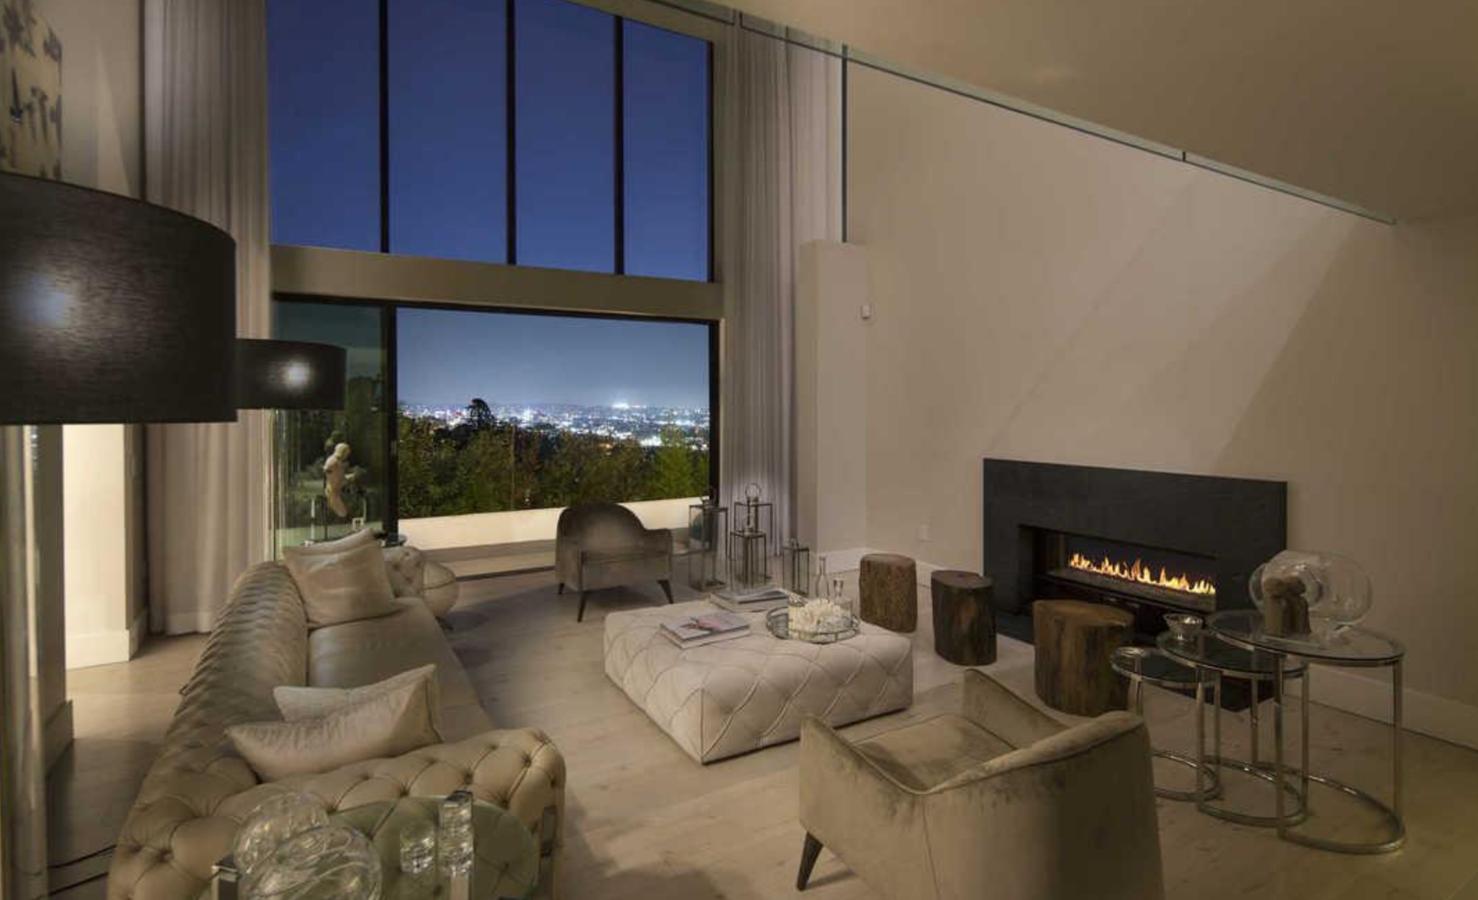 Salon con chimenea de la casa de Demi Lovato en Los Angeles. Salón de doble altura con chimenea de la casa de Demi Lovato en Los Ángeles